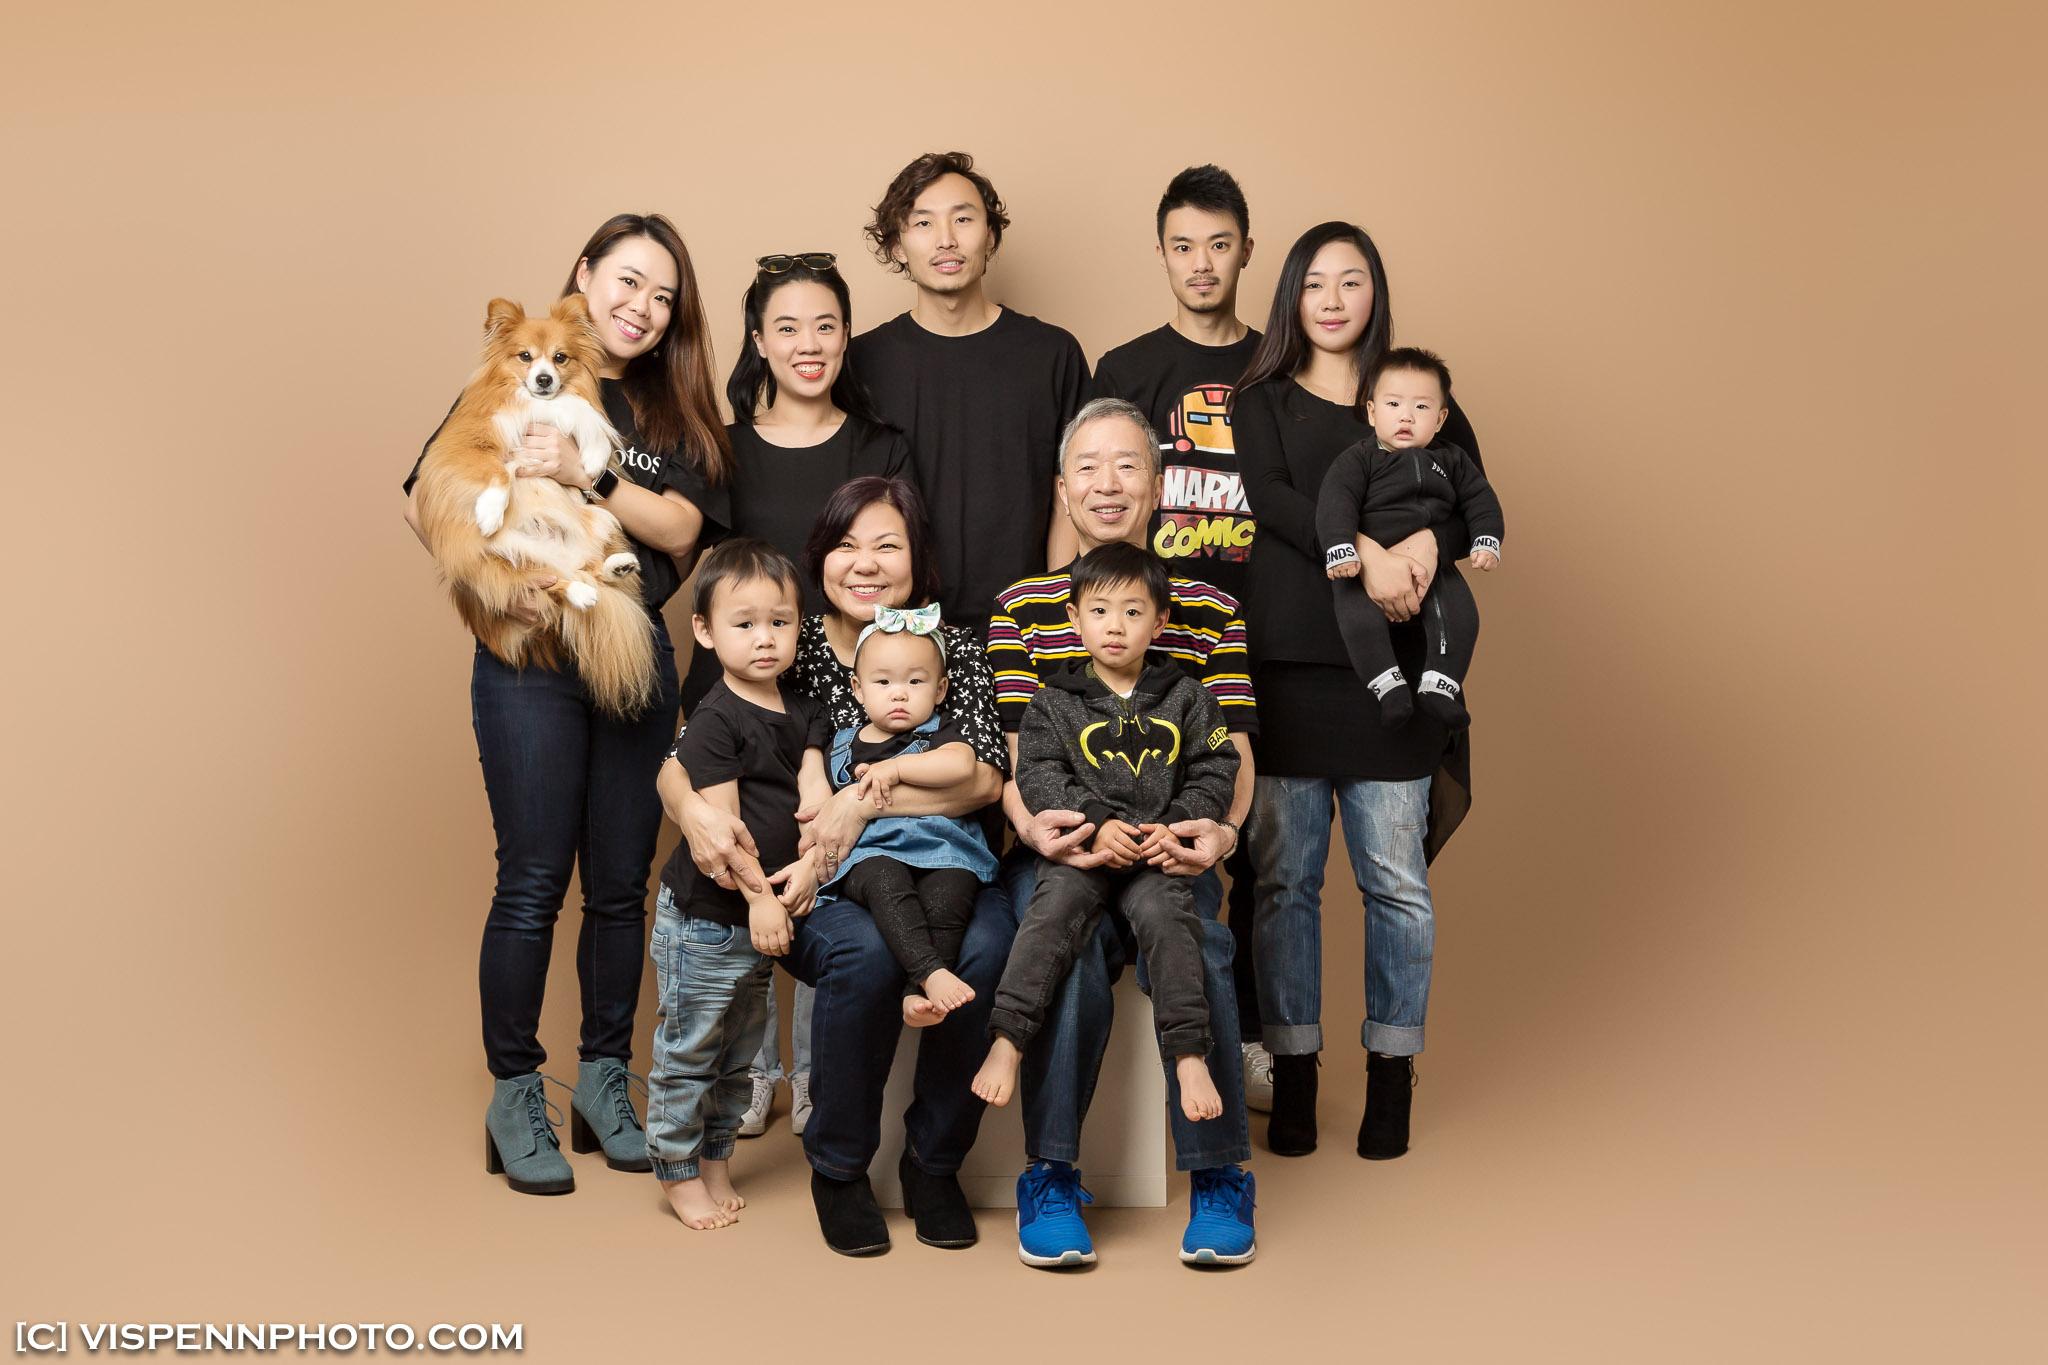 Melbourne Newborn Baby Family Photo BaoBao VISPENN 墨尔本 儿童 宝宝 百天照 满月照 孕妇照 全家福 KIDS ChristyHau 1011 VISPENN